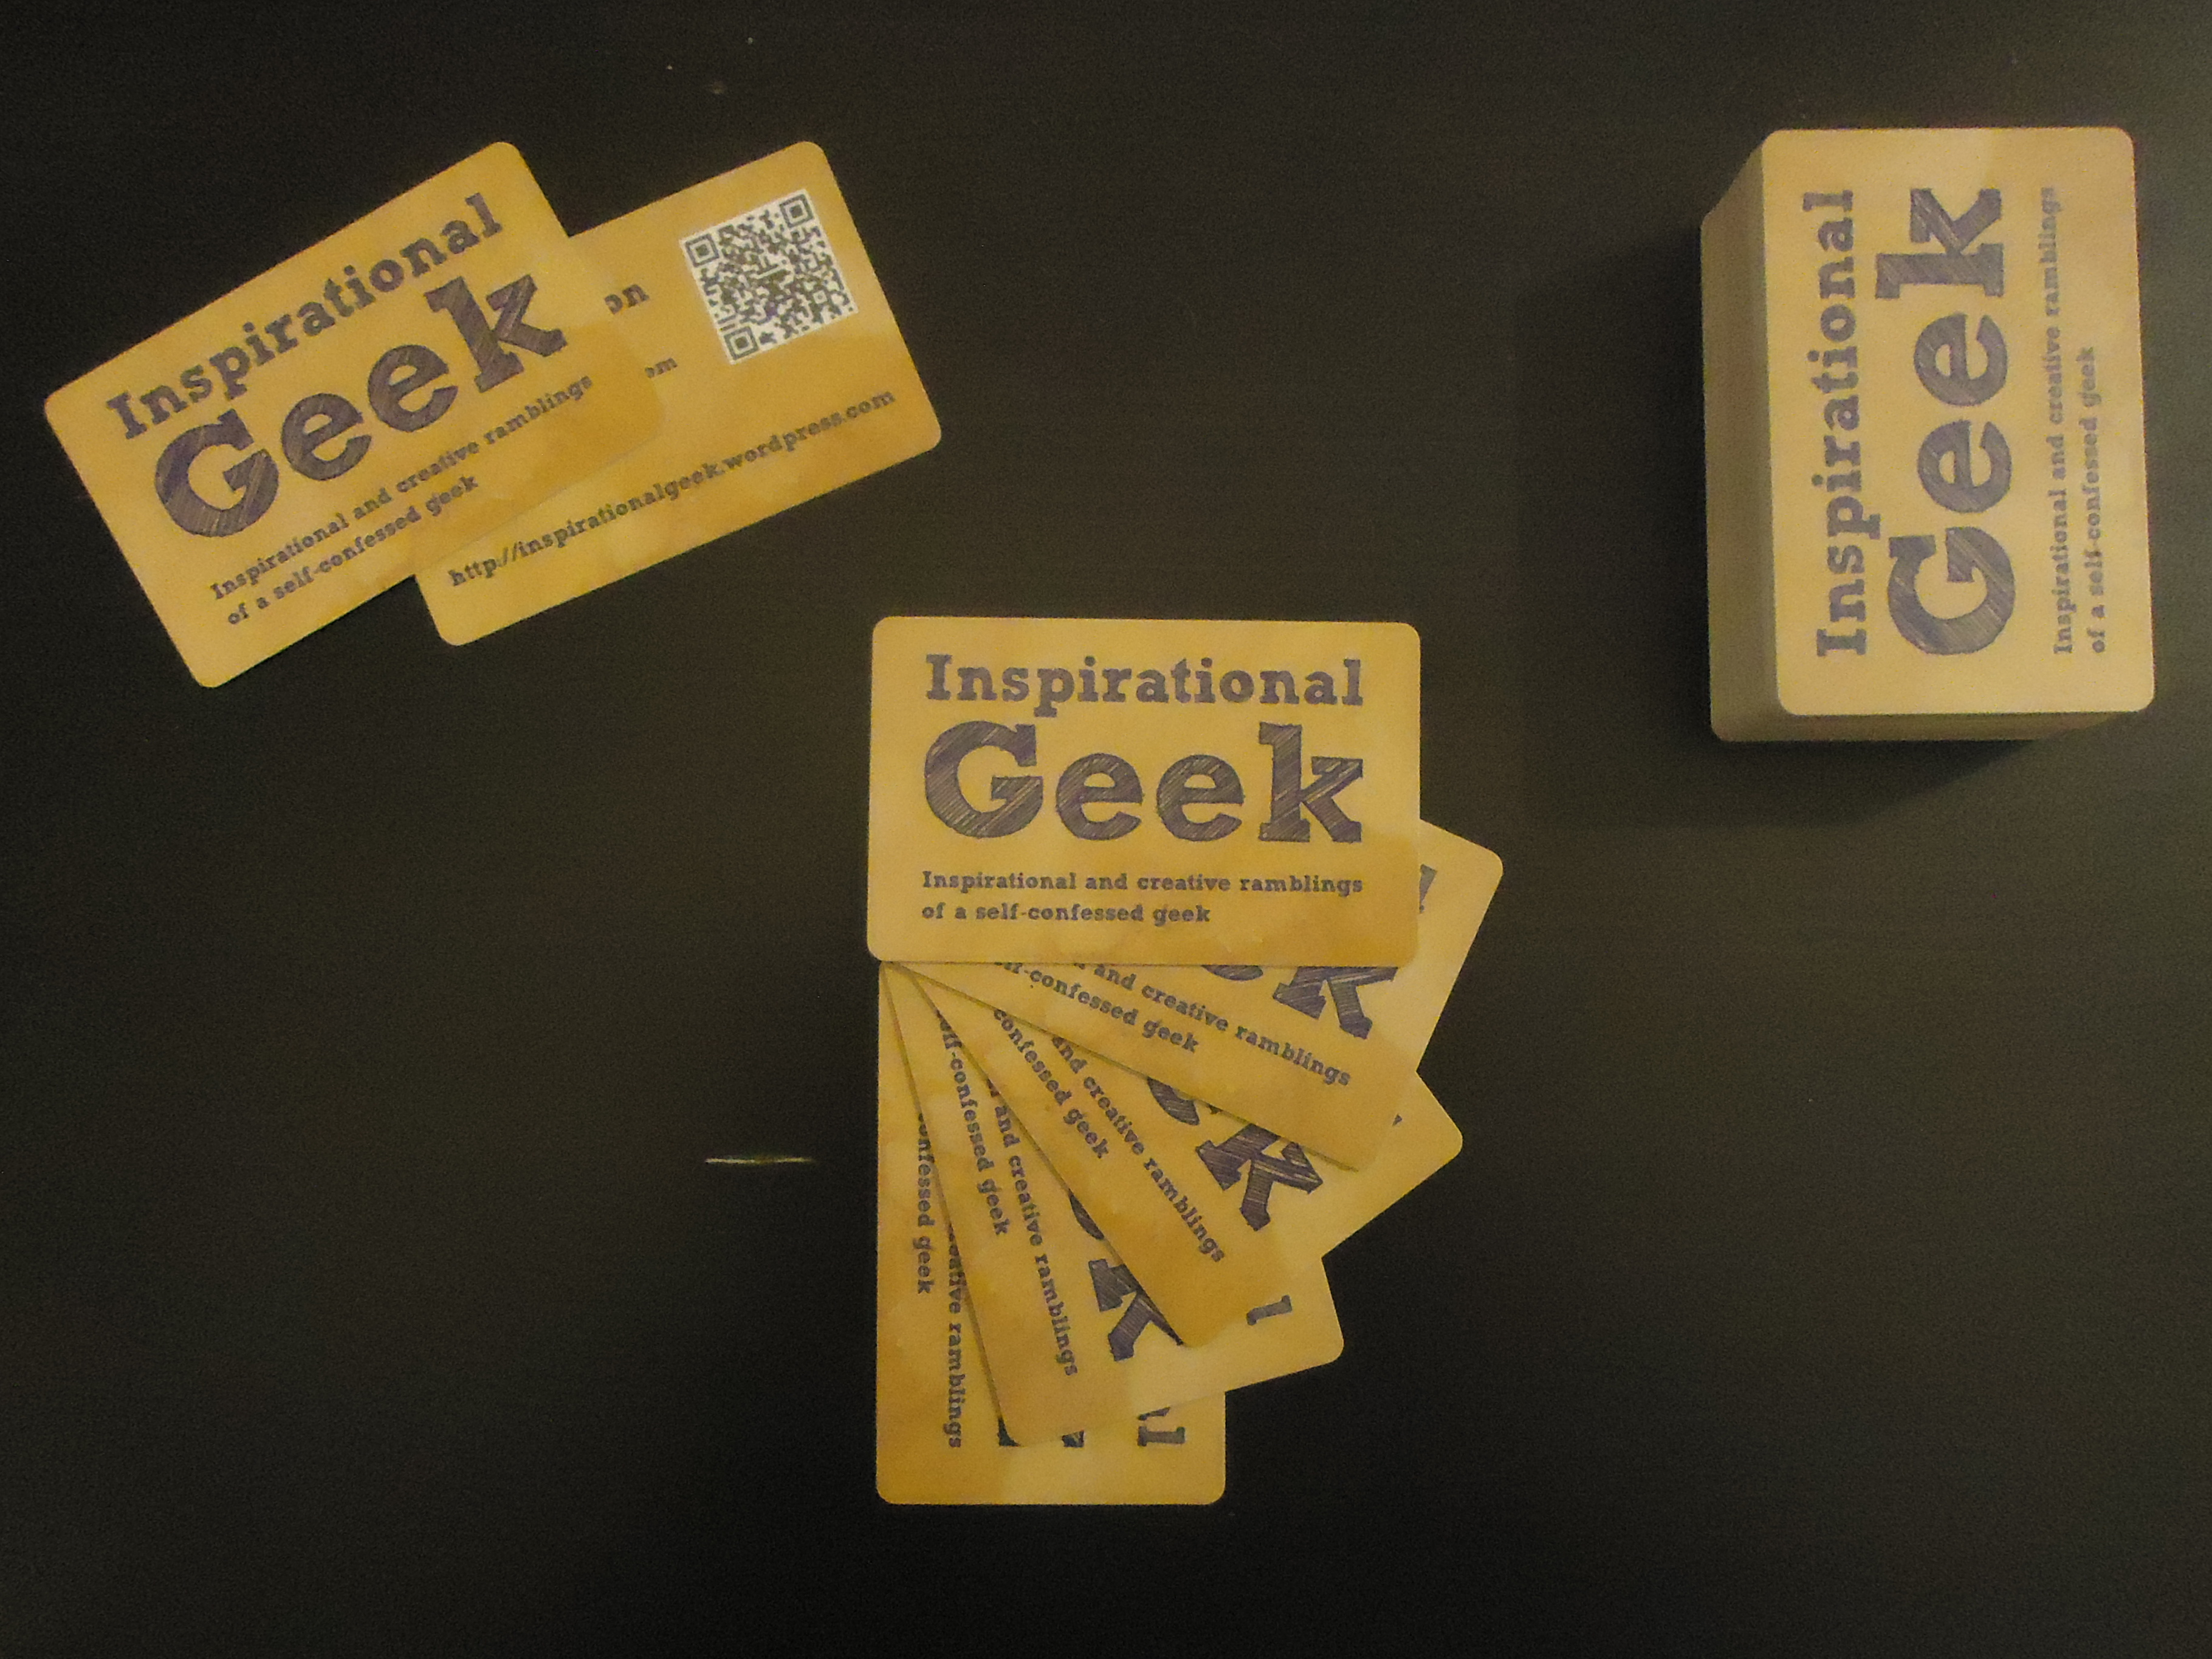 business cards | Inspirational Geek